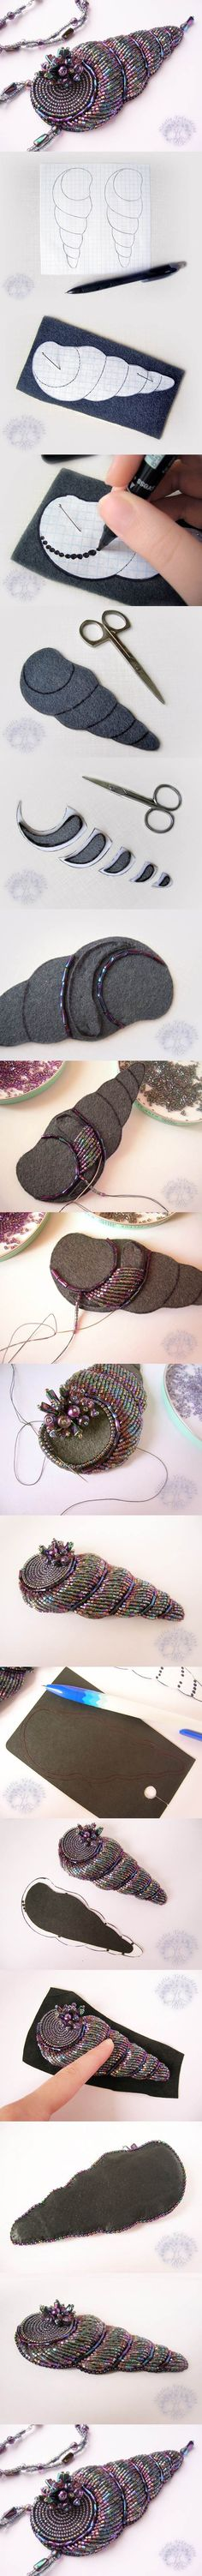 DIY Beaded Spiral Shell Pendant | iCreativeIdeas.com Like Us on Facebook ==> https://www.facebook.com/icreativeideas